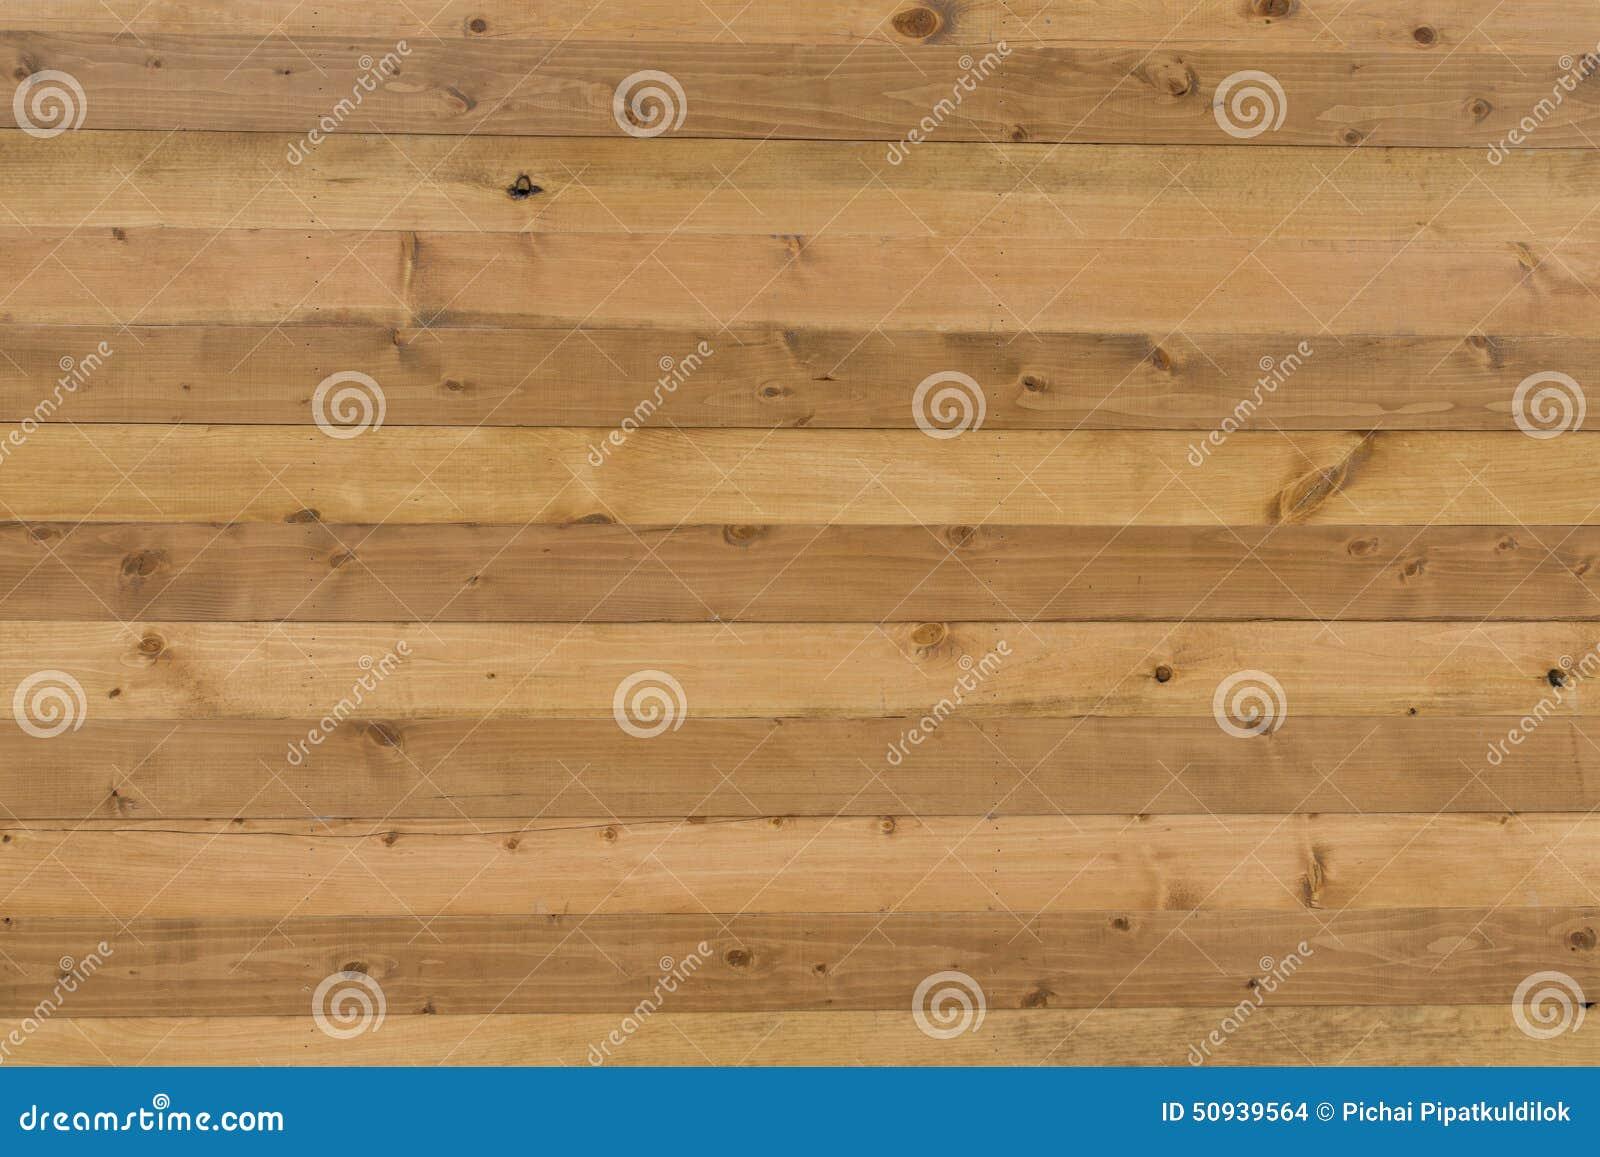 Fußbodenbelag ~ Alte hölzerne beschaffenheit fußbodenbelag stockfoto bild von